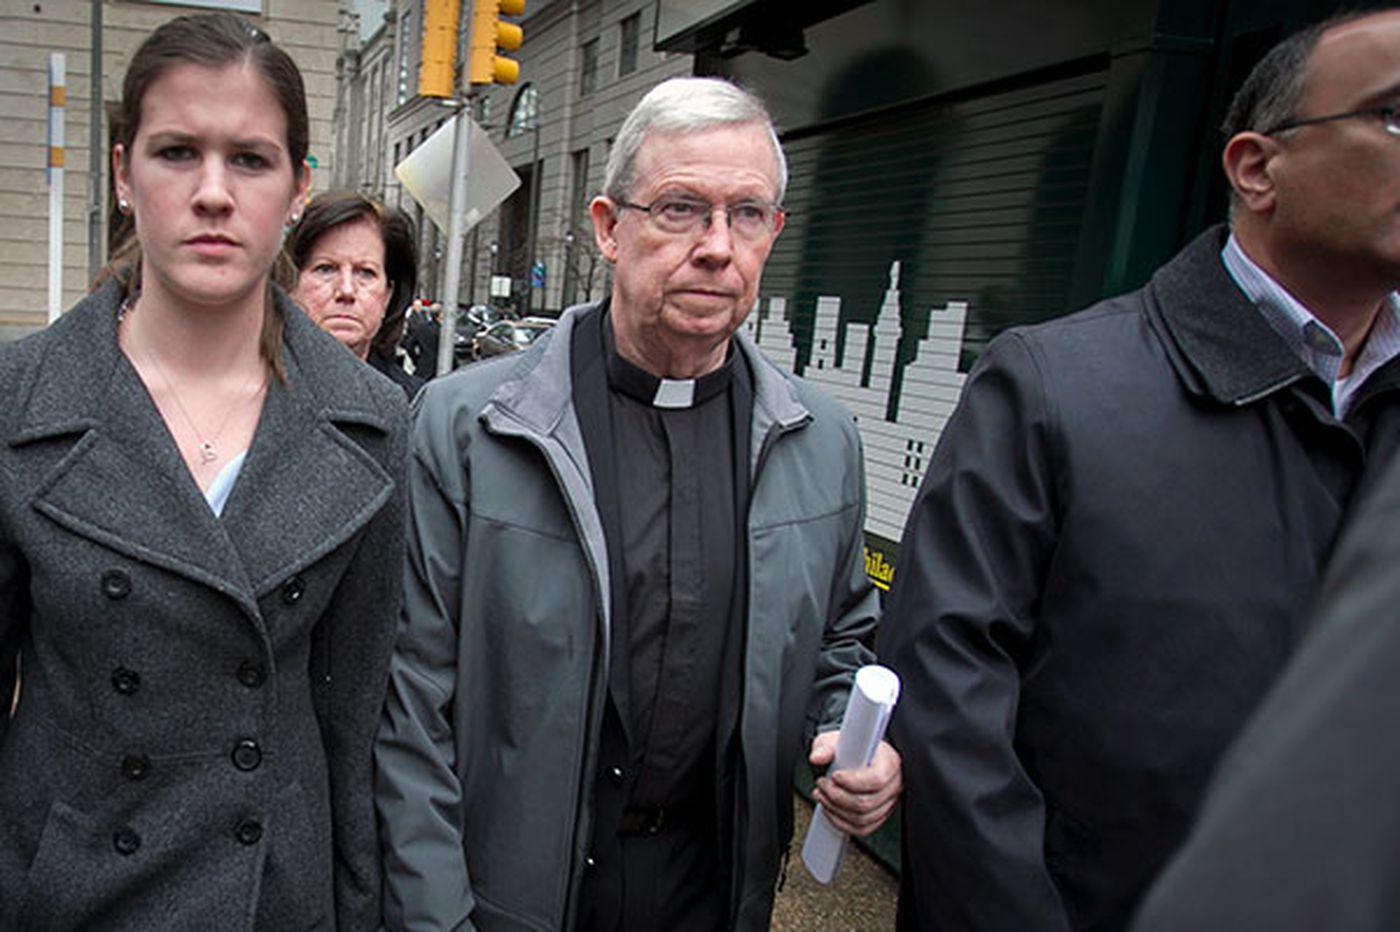 Philadelphia Archdiocese prolongs its own suffering